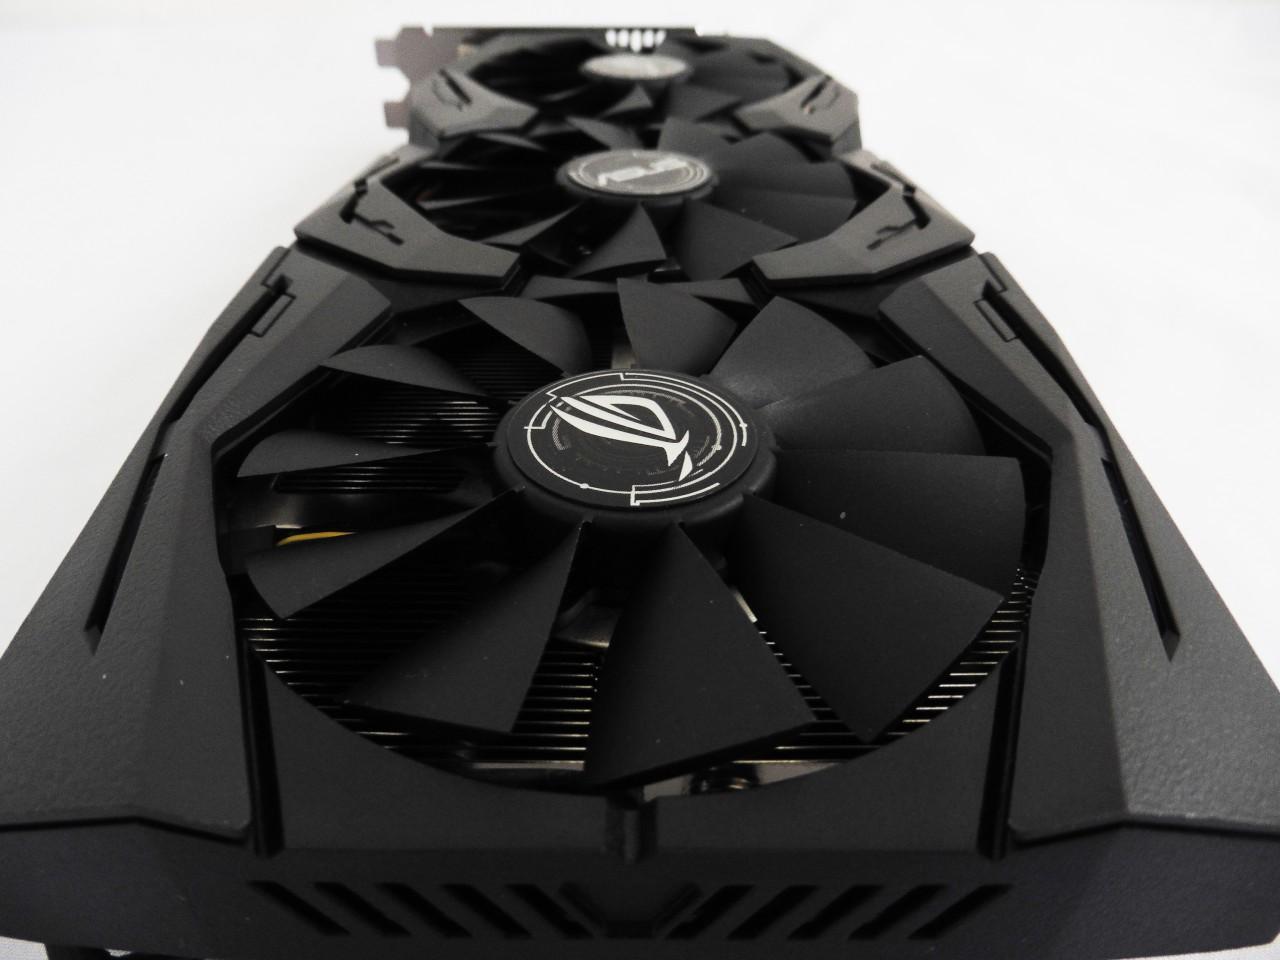 ASUS ROG Strix GeForce GTX 1070 Review 35